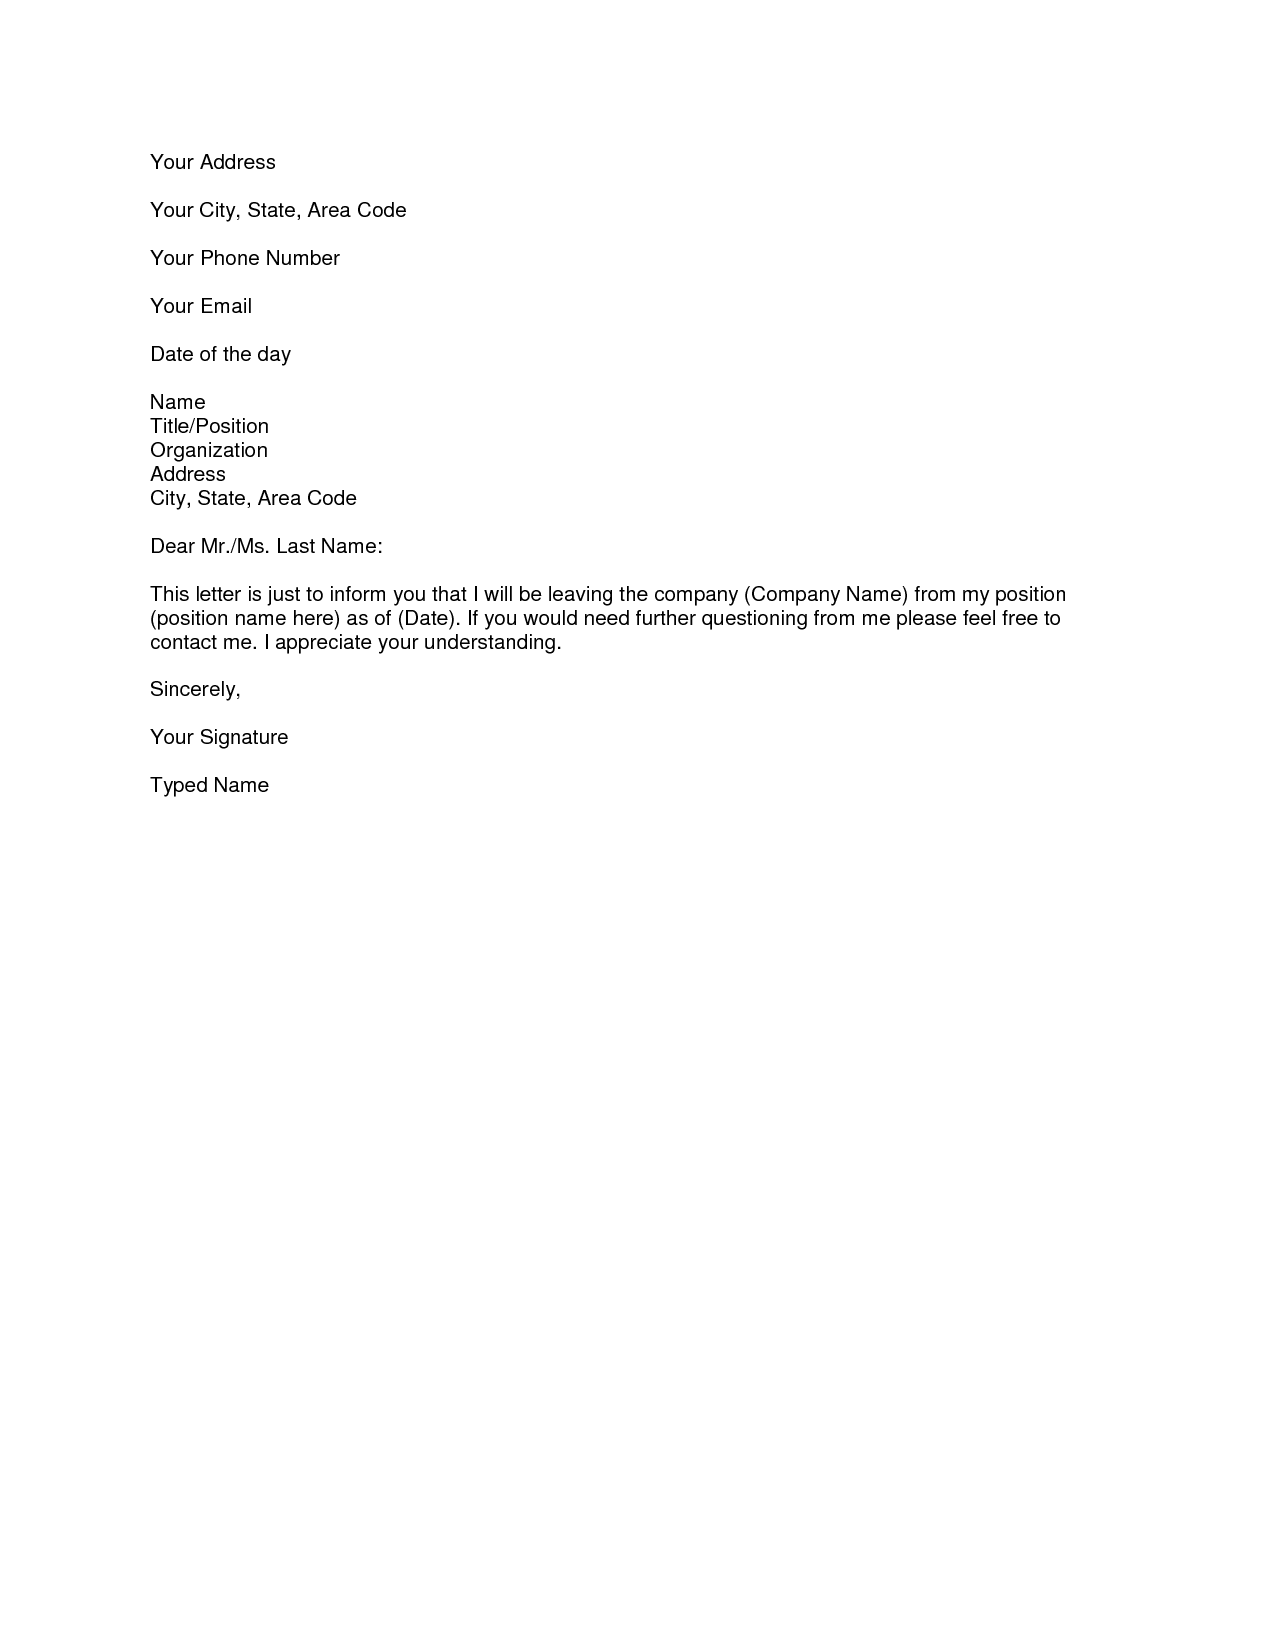 brief resignation letter template  Resignation Letters Download PDF, DOC Format - brief resignation letter template